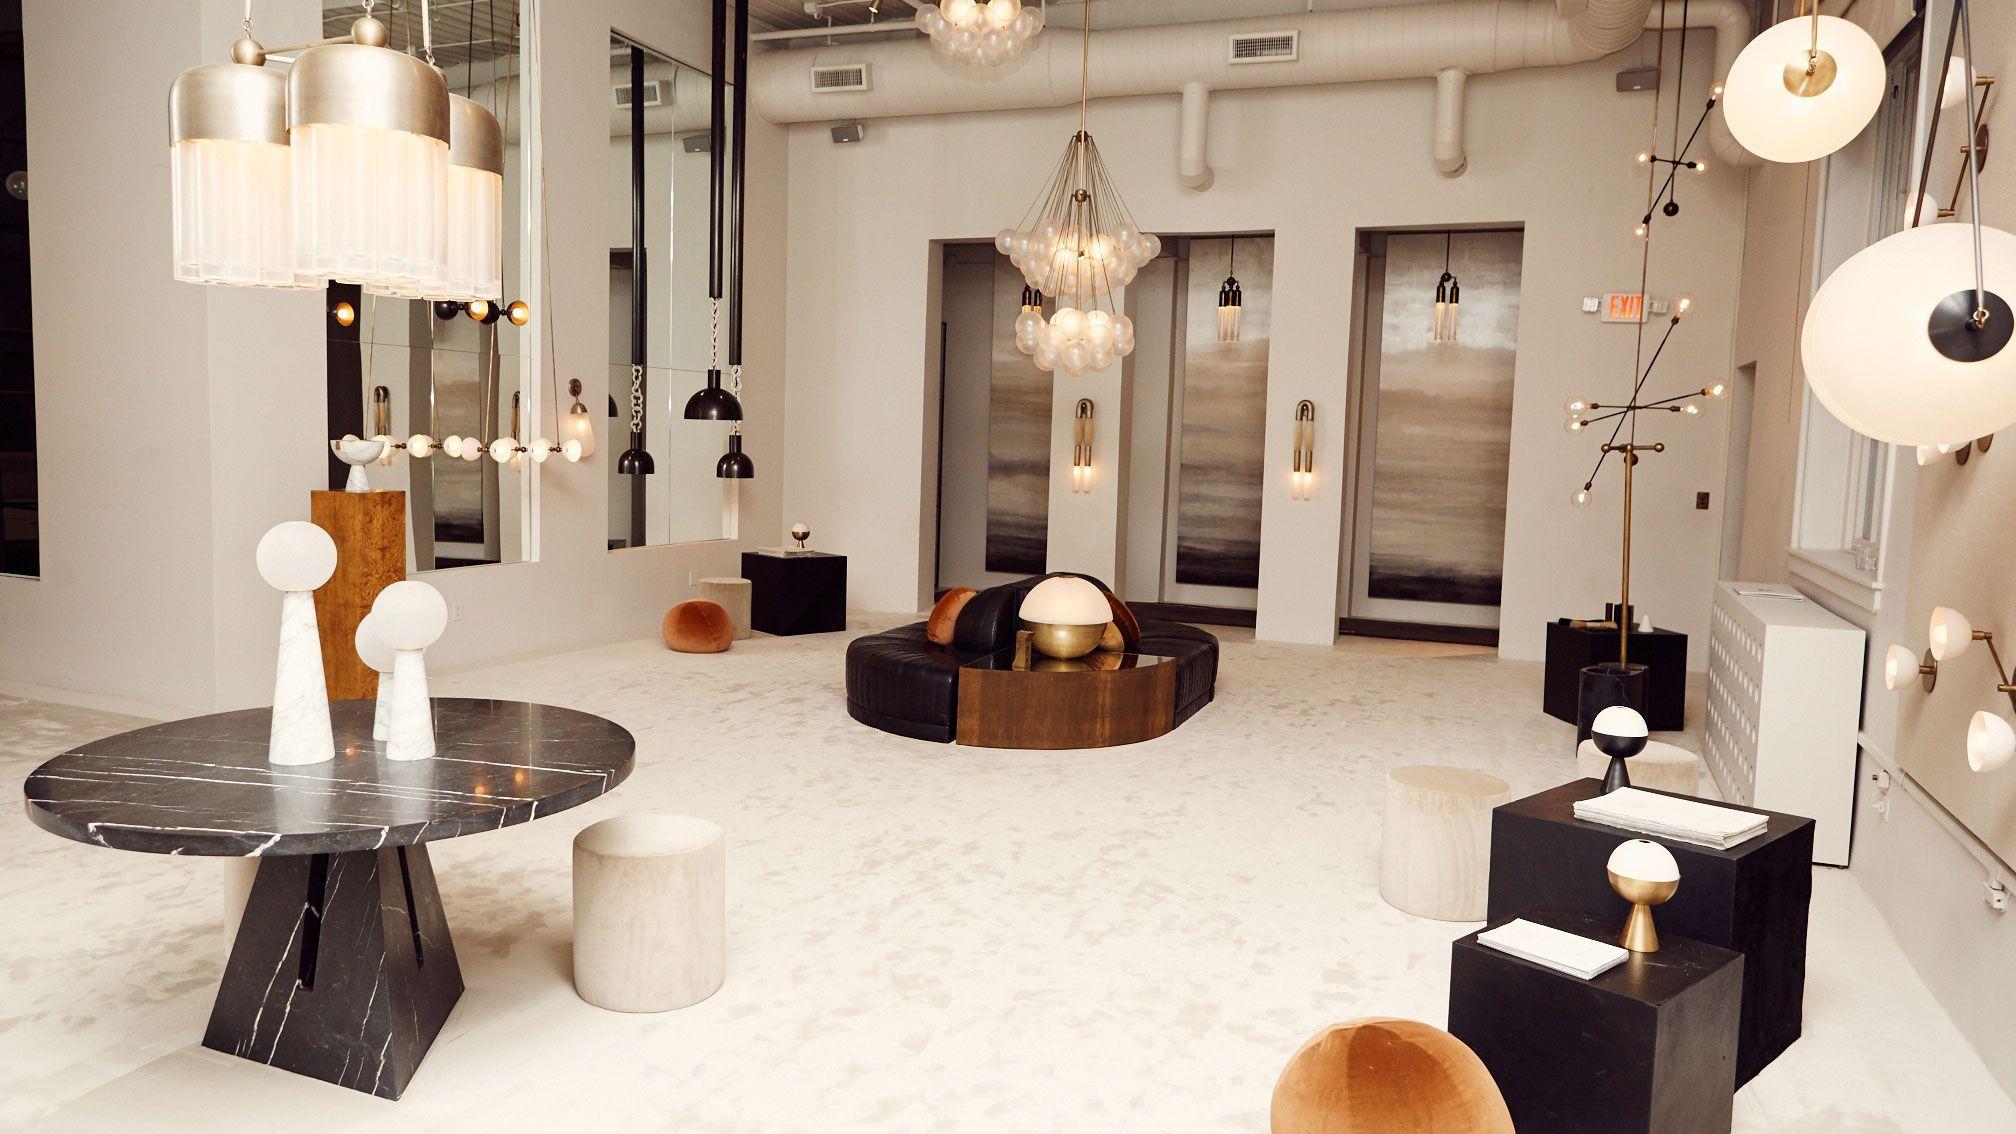 Inside the Most Stunning Design Studio We've Ever Seen